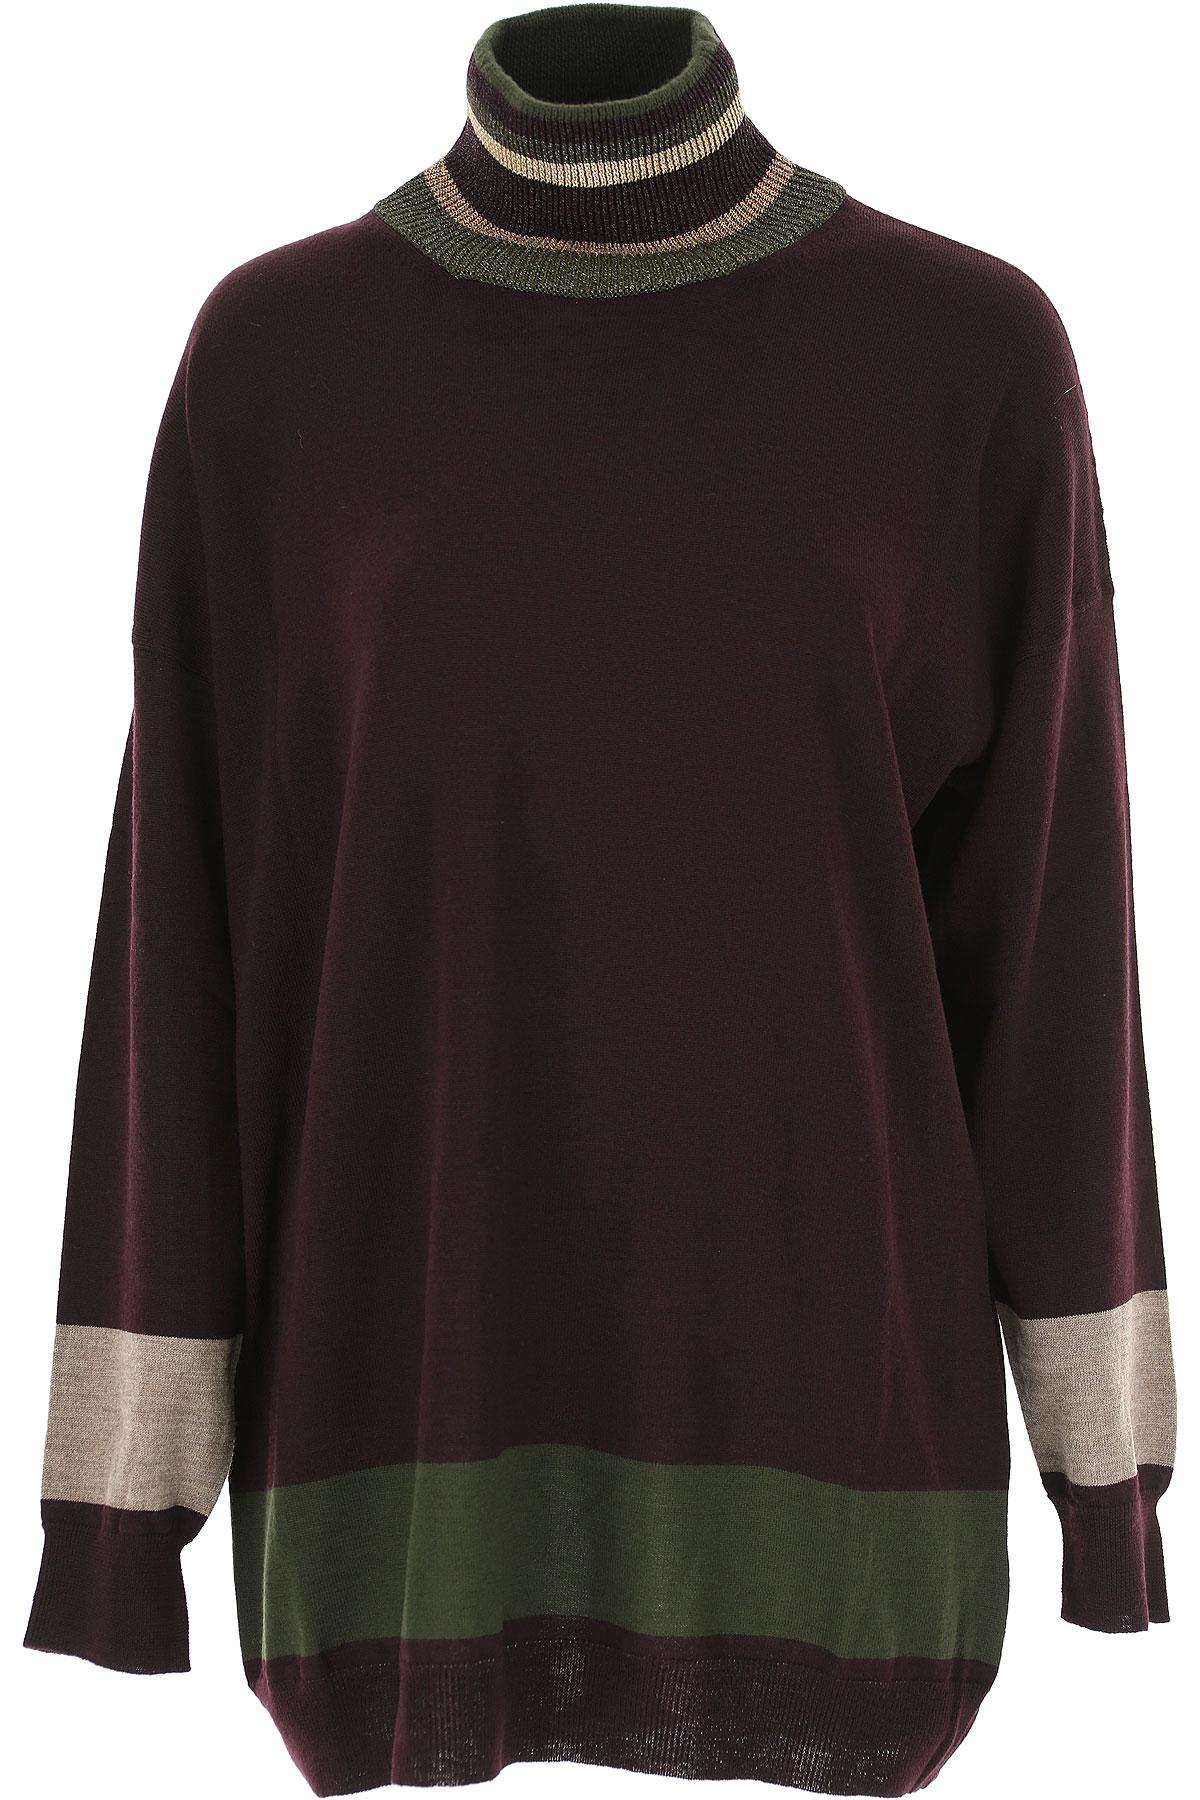 Image of Antonio Marras Sweater for Women Jumper, Dark Bordeaux, Wool, 2017, 4 6